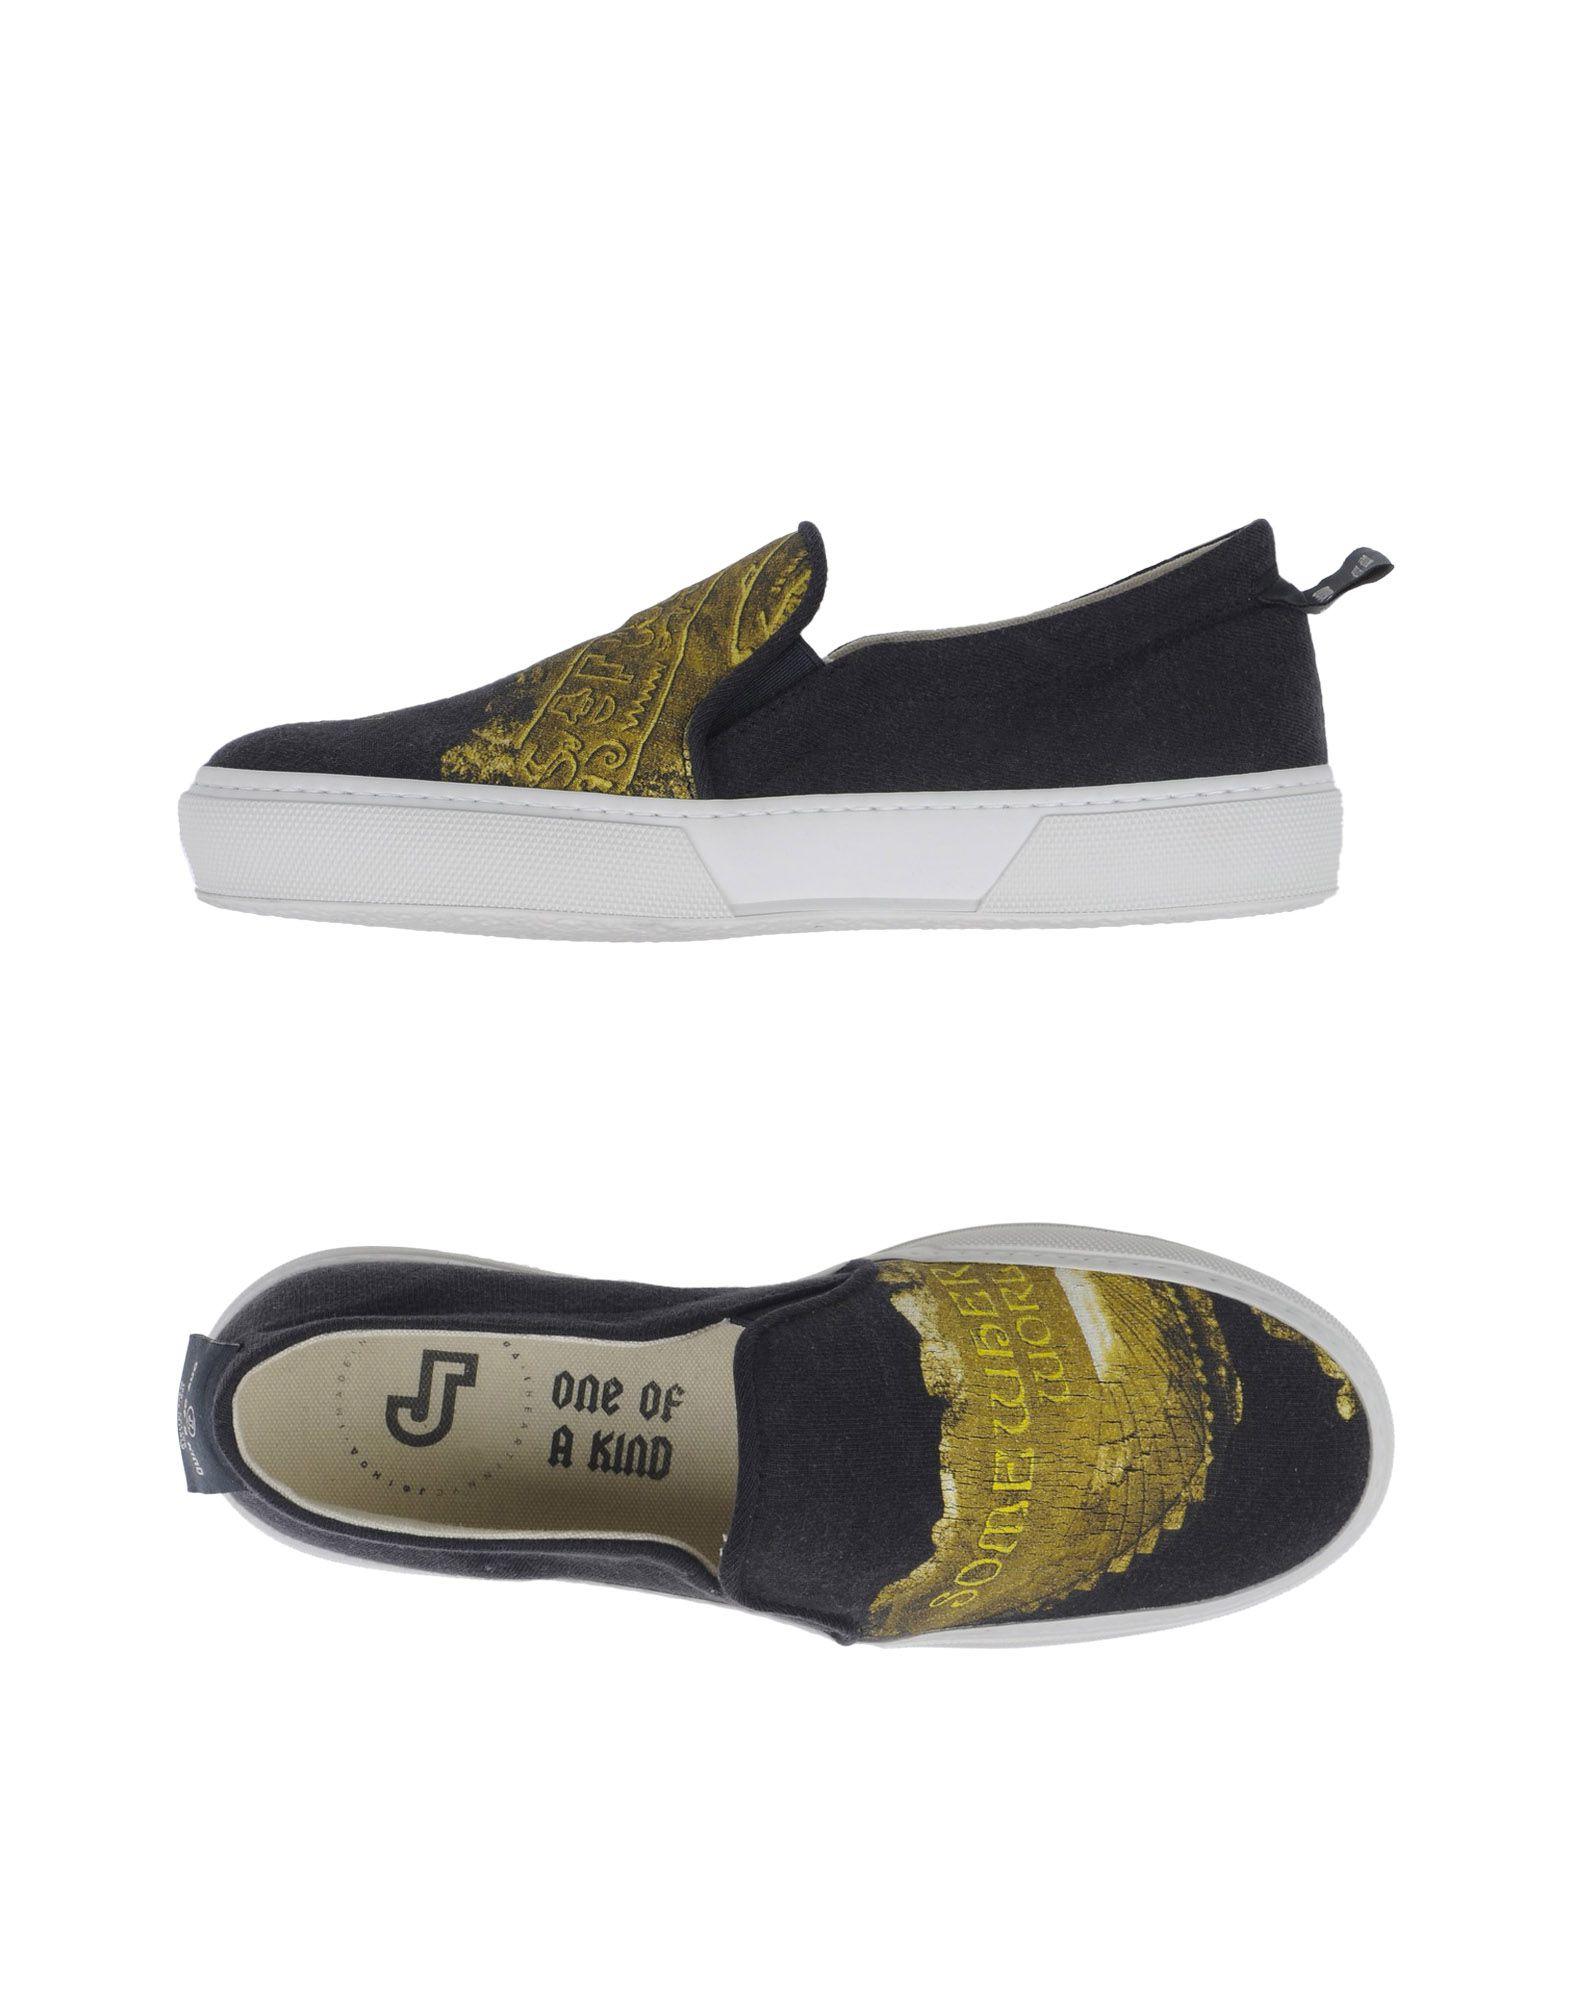 Moda Sneakers Joshua*S Joshua*S Sneakers Uomo - 11343148IT 02a4a5